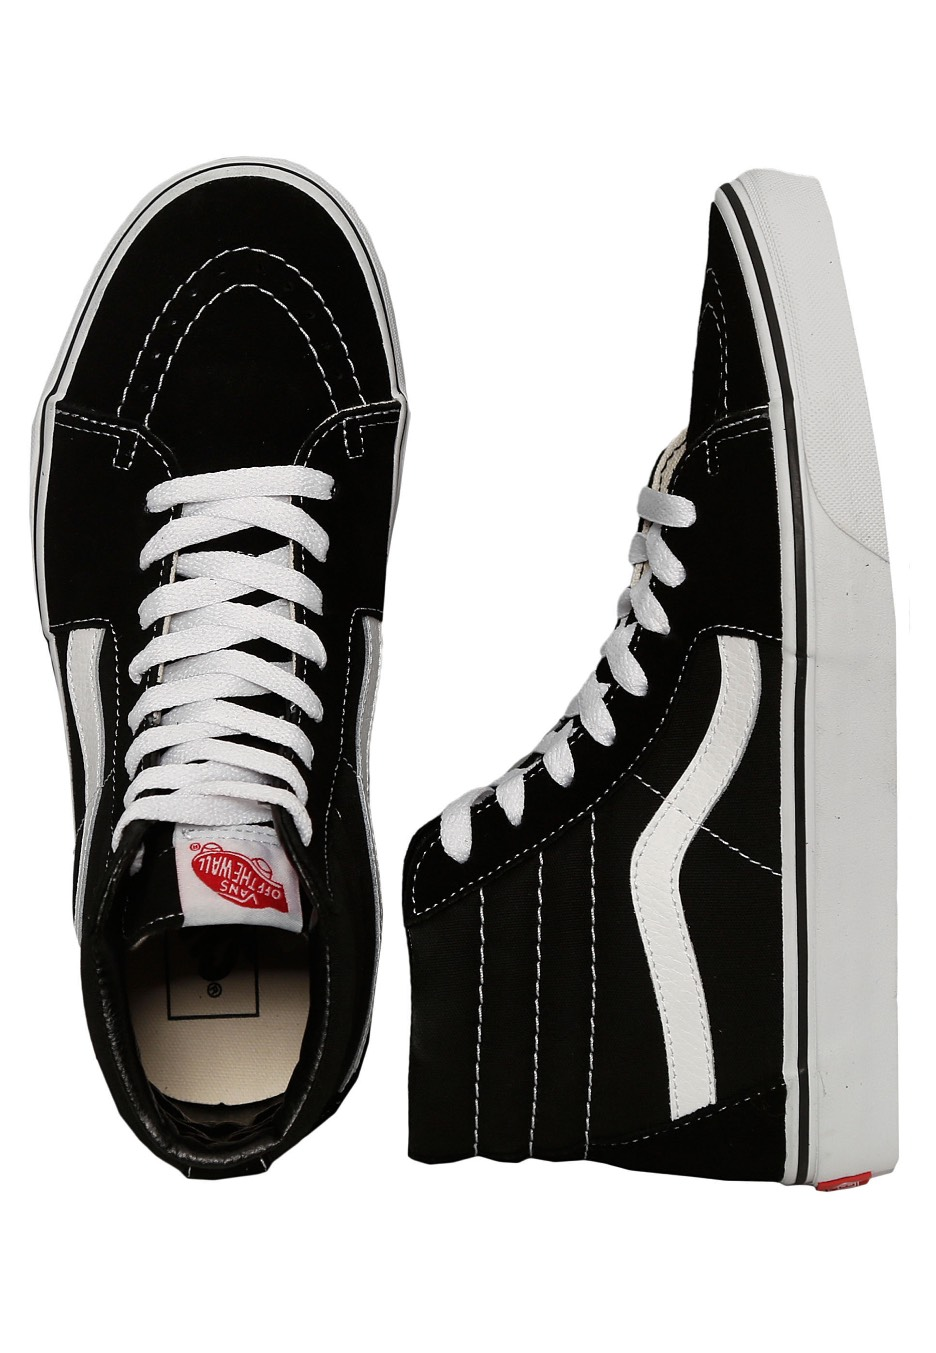 Vans - Sk8-Hi Black Black White - Shoes - Impericon.com Worldwide cedc993f3